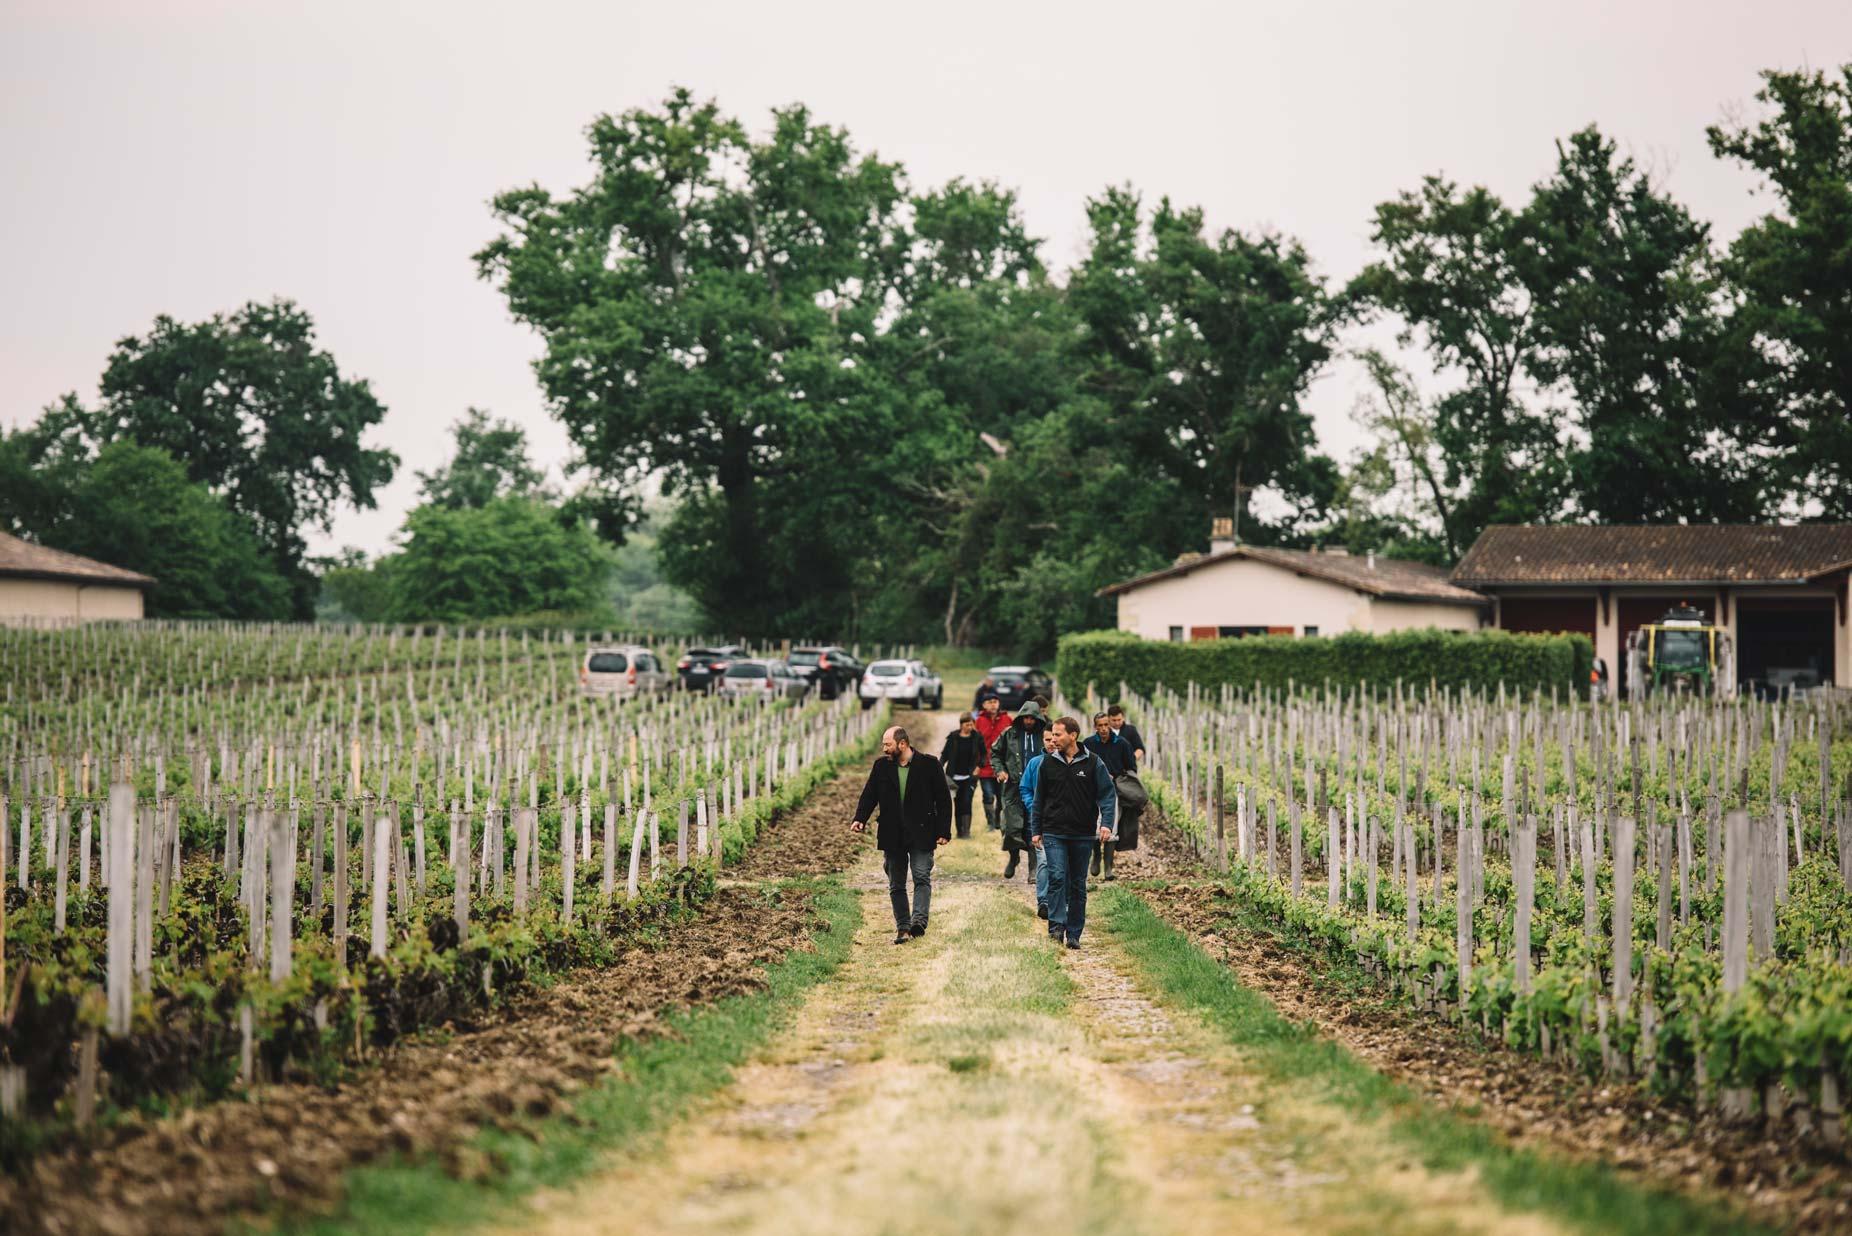 Spring training | Château Haut-Bailly | Pessac | Bordeaux